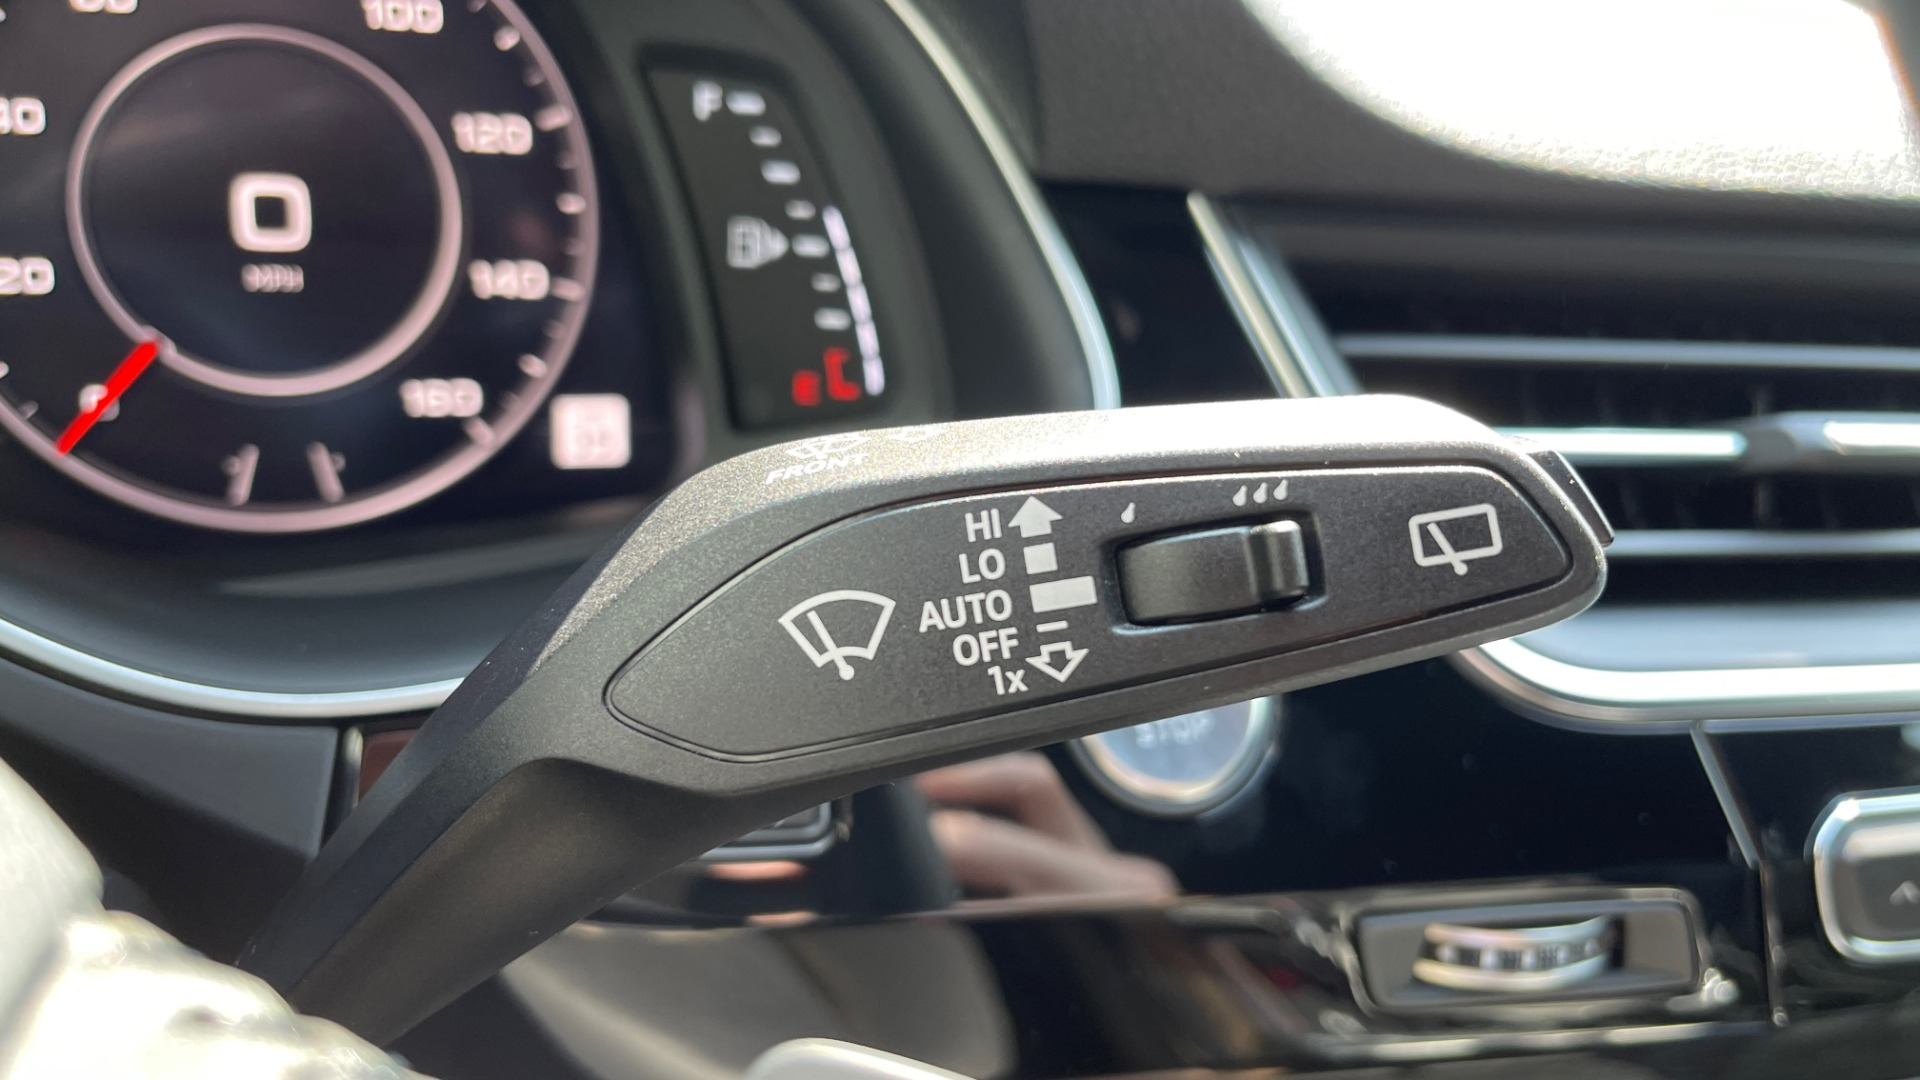 Used 2018 Audi Q7 PRESTIGE TIPTRONIC / NAV / SUNROOF / ADAPTIVE PKG / DRVR ASST / CLD WTHR /  for sale $49,995 at Formula Imports in Charlotte NC 28227 41